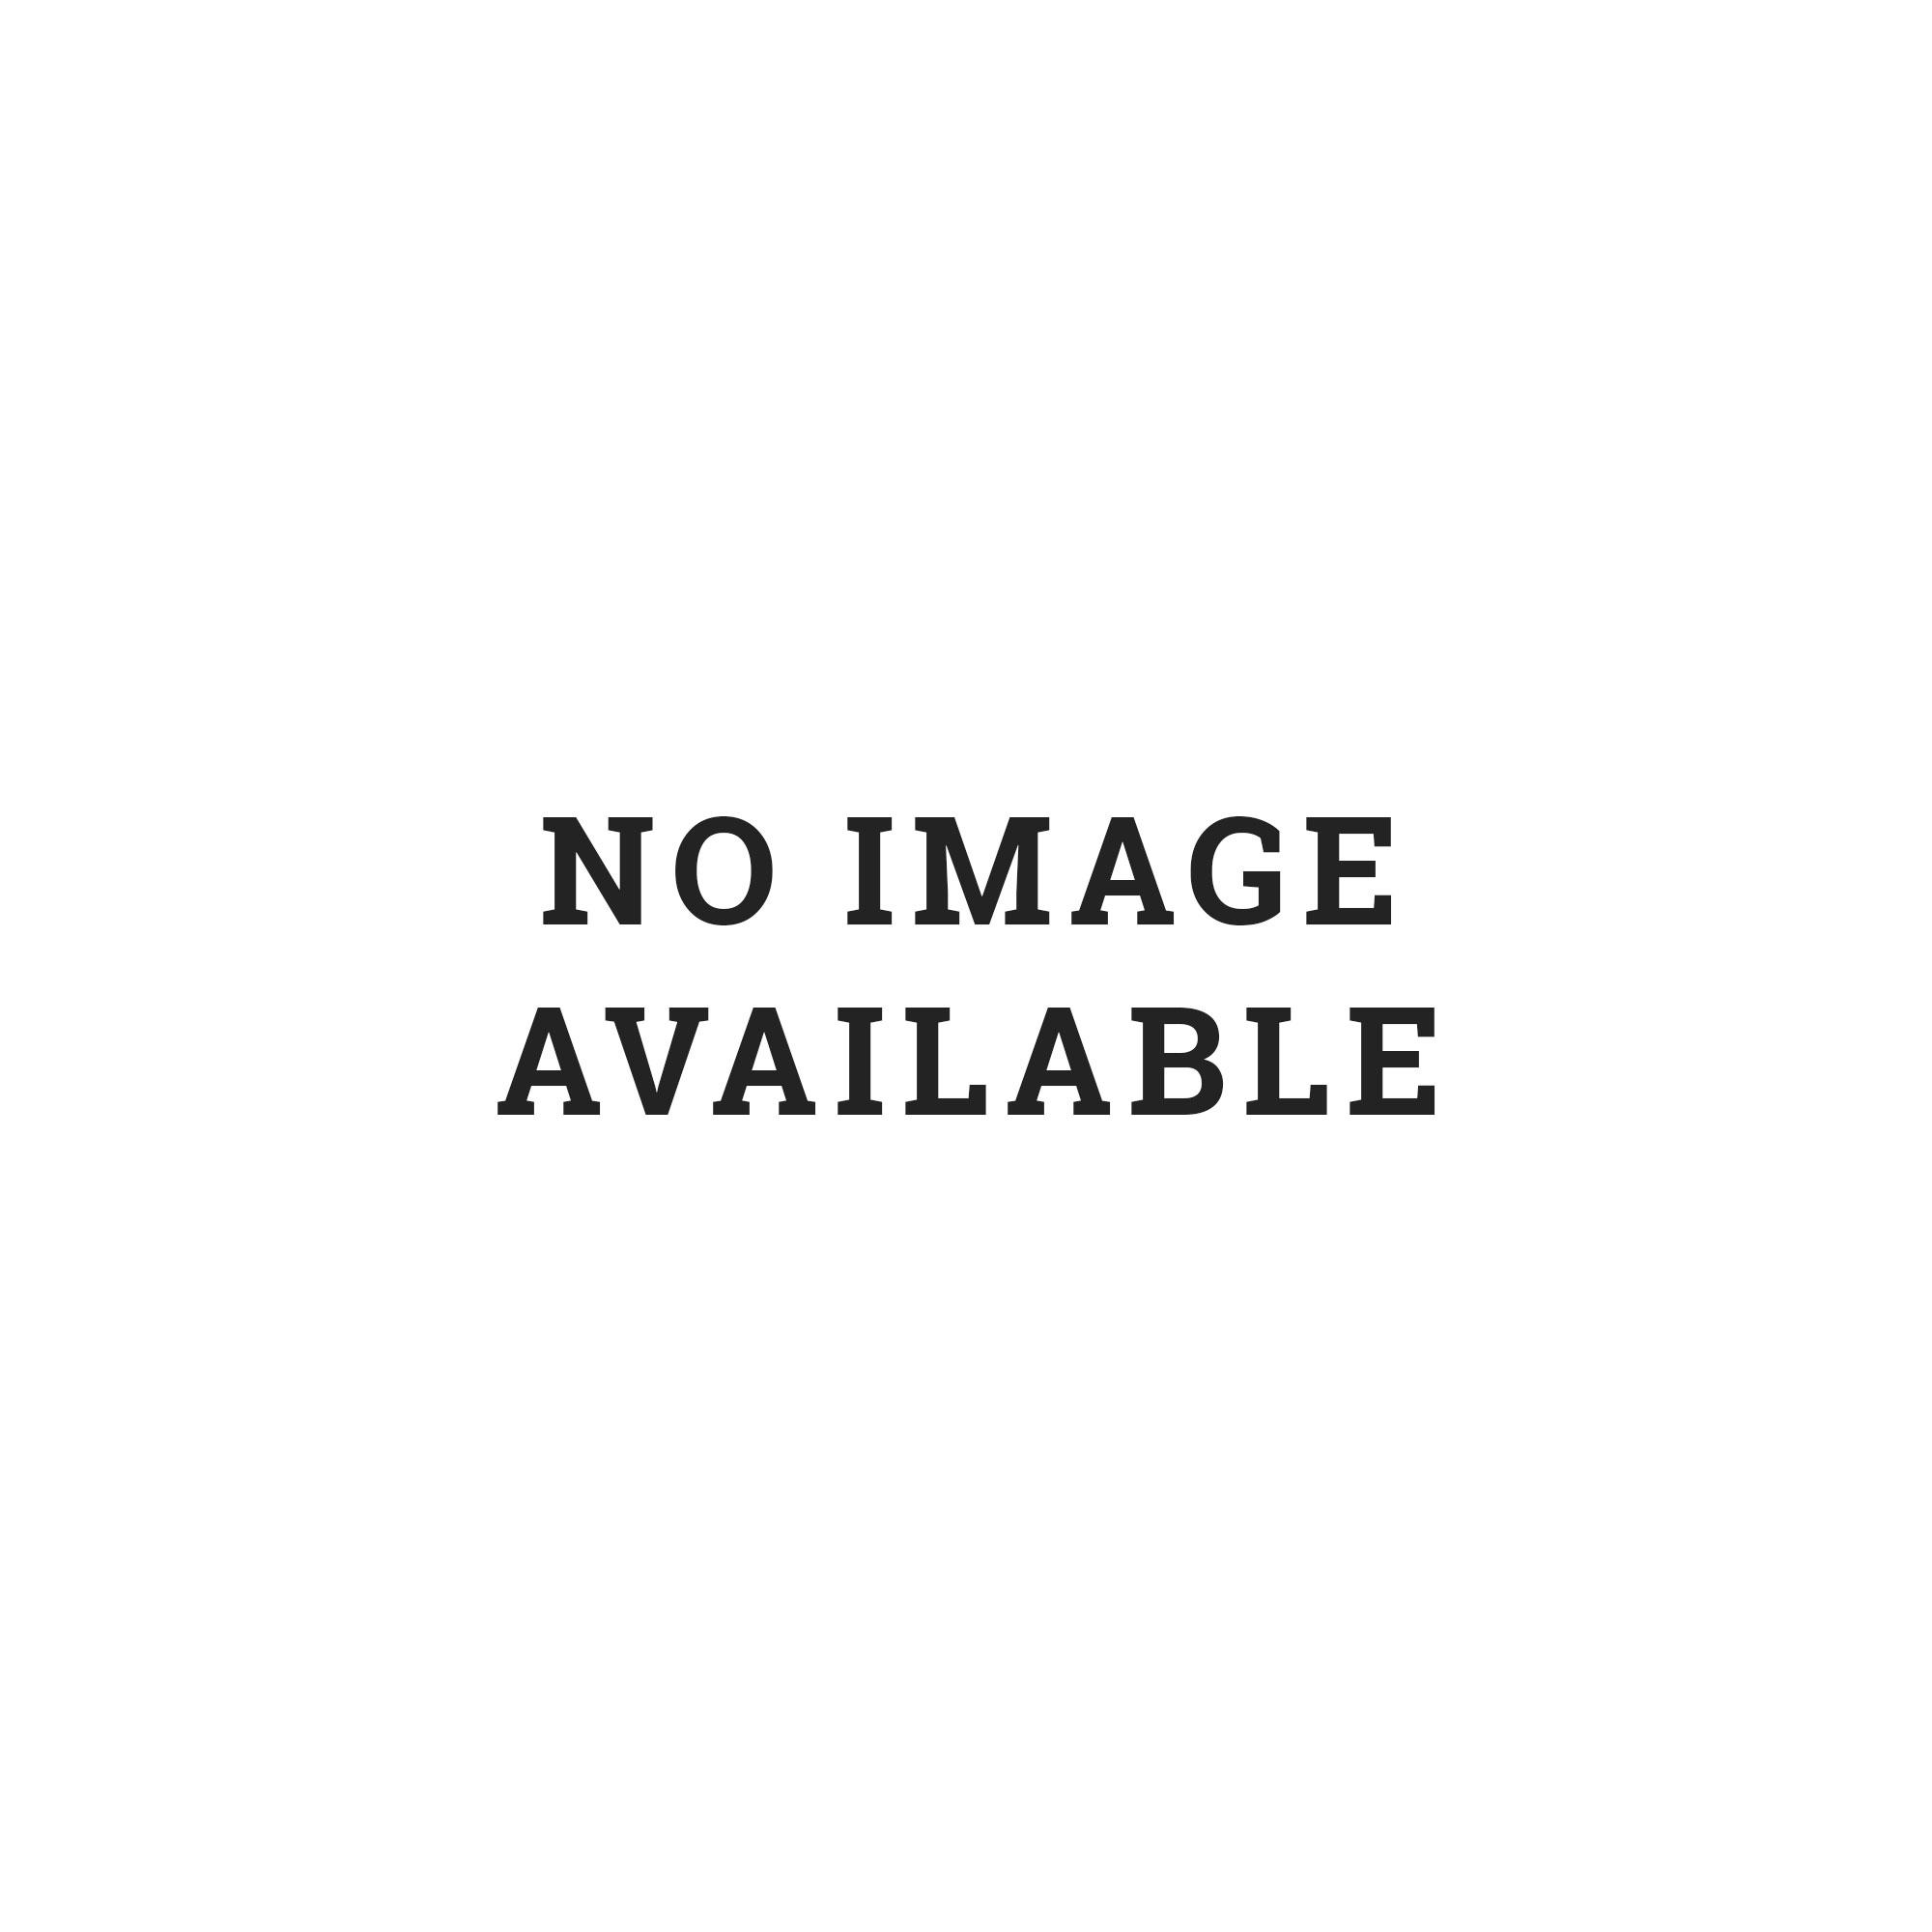 Etnies Barge LS Mens Suede Leather 5-Eyelet Skate Shoes - Burgundy Red & White